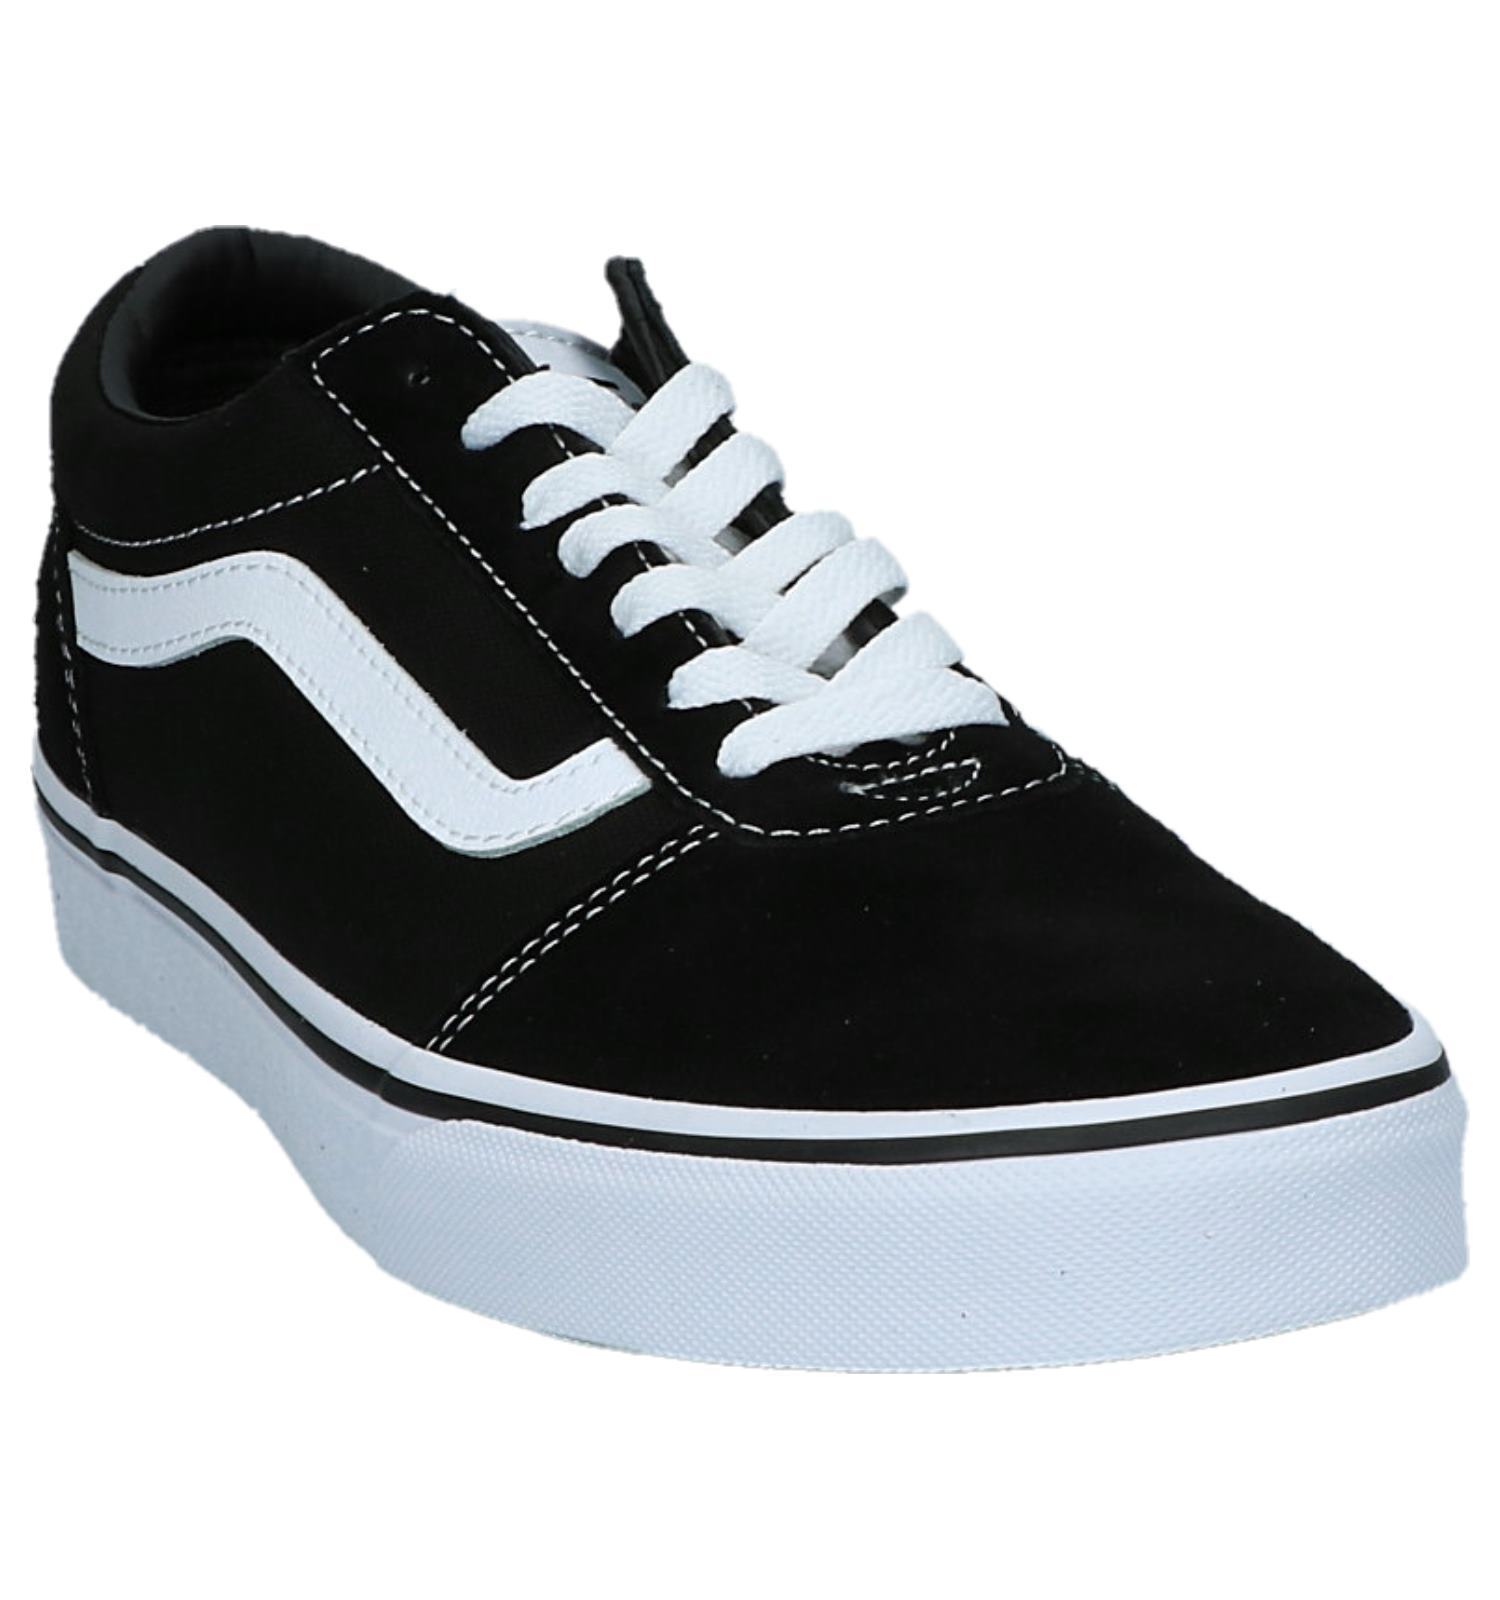 Skateschoenen Ward Zwarte Ward Zwarte Skateschoenen Vans Vans Zwarte Zwarte Skateschoenen Ward Vans Vans Ward sCQdhrtx